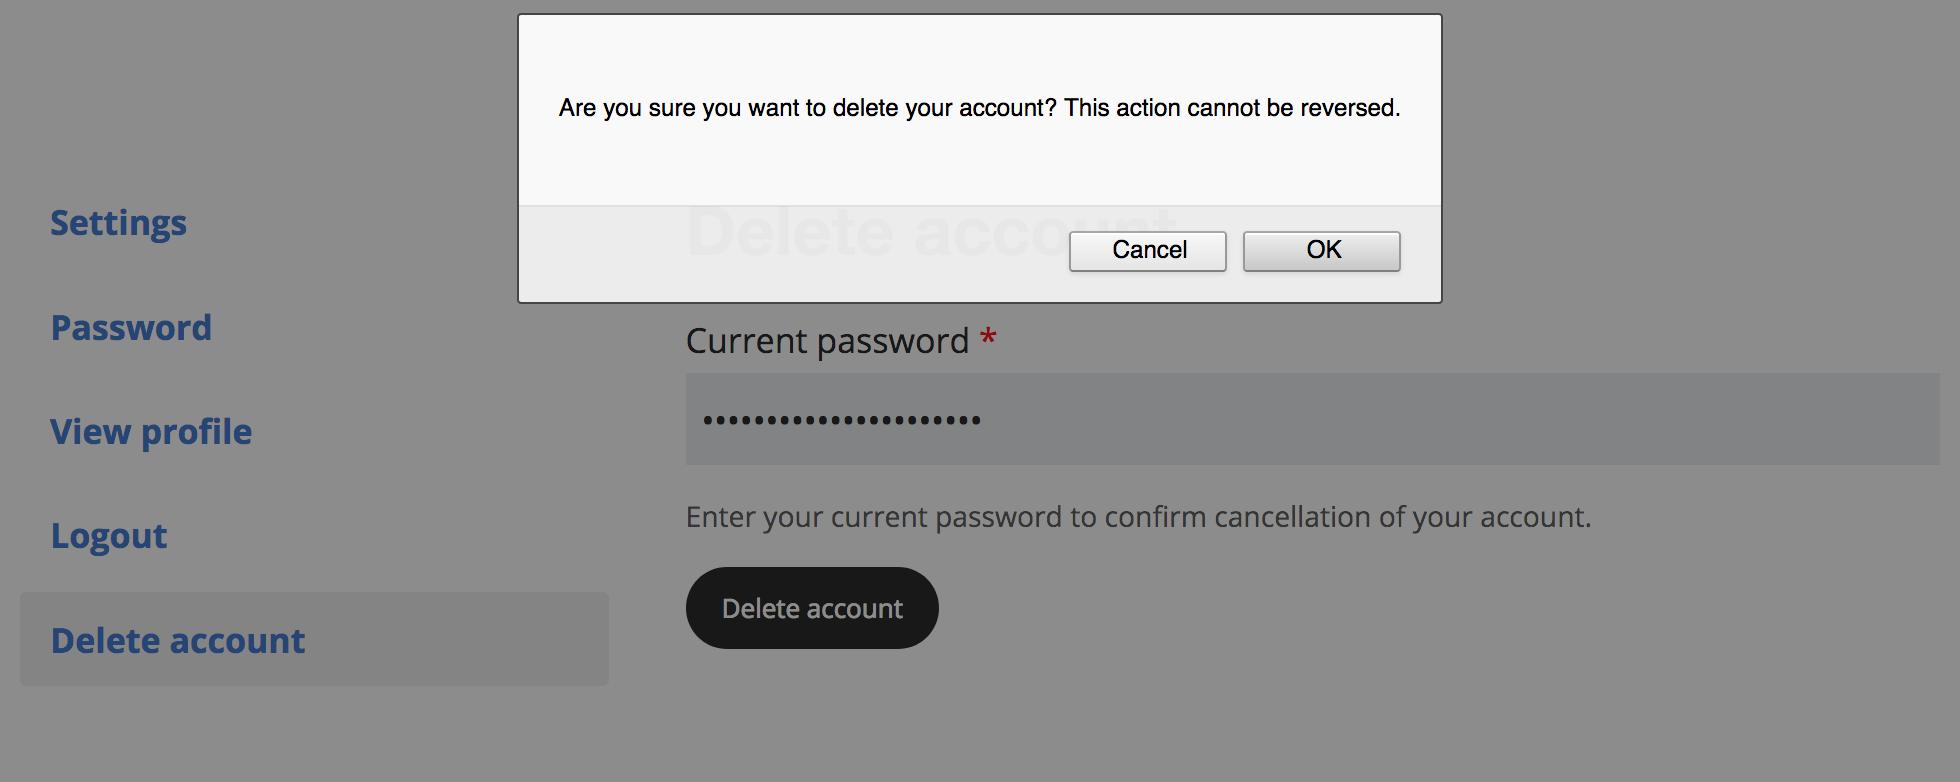 Delete Account screenshot